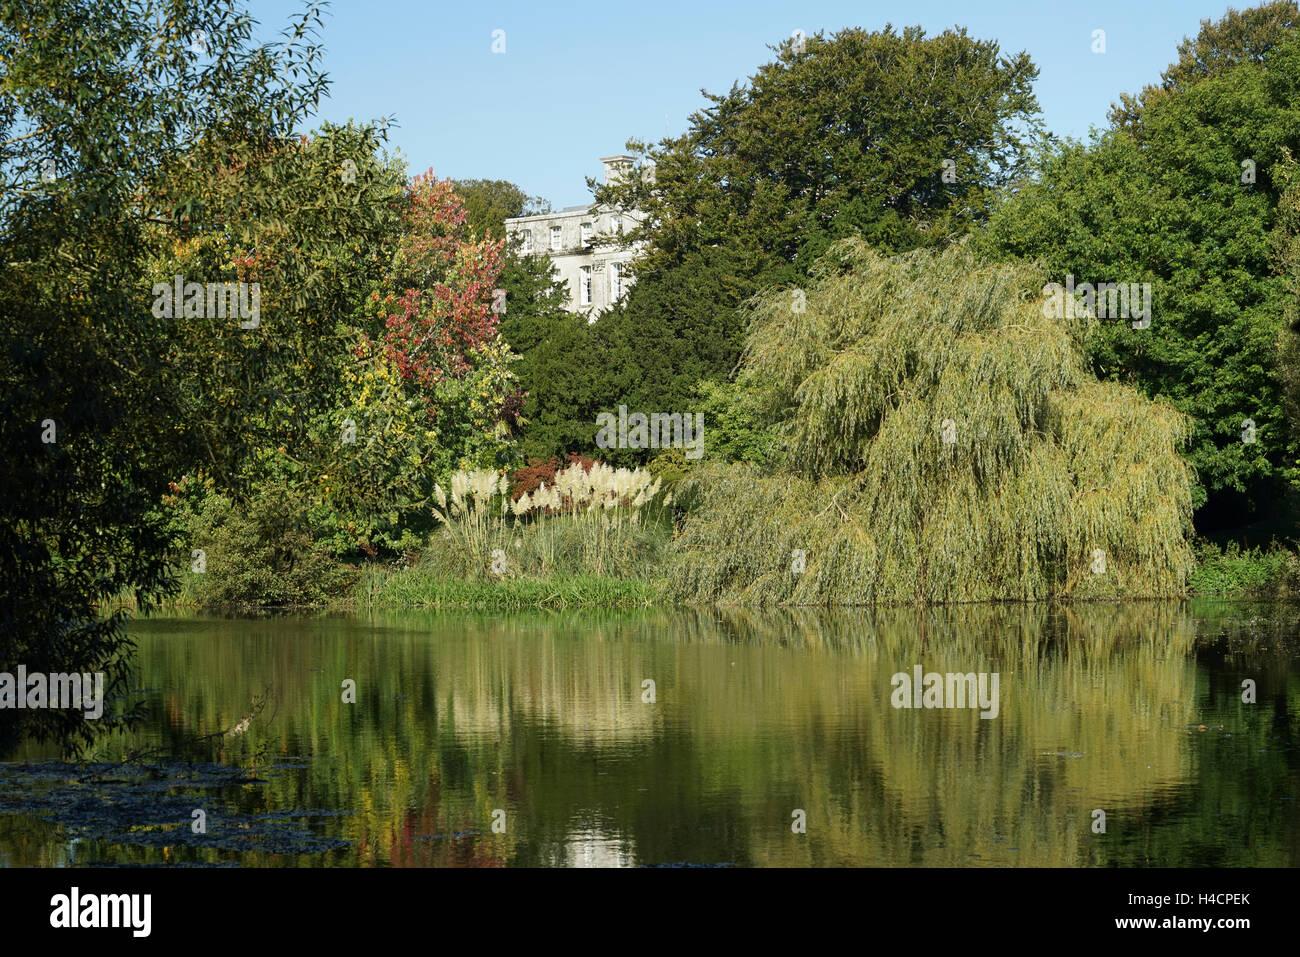 Reflections in the Kingston Maurward Lake, Dorchester, Dorset -1 - Stock Image